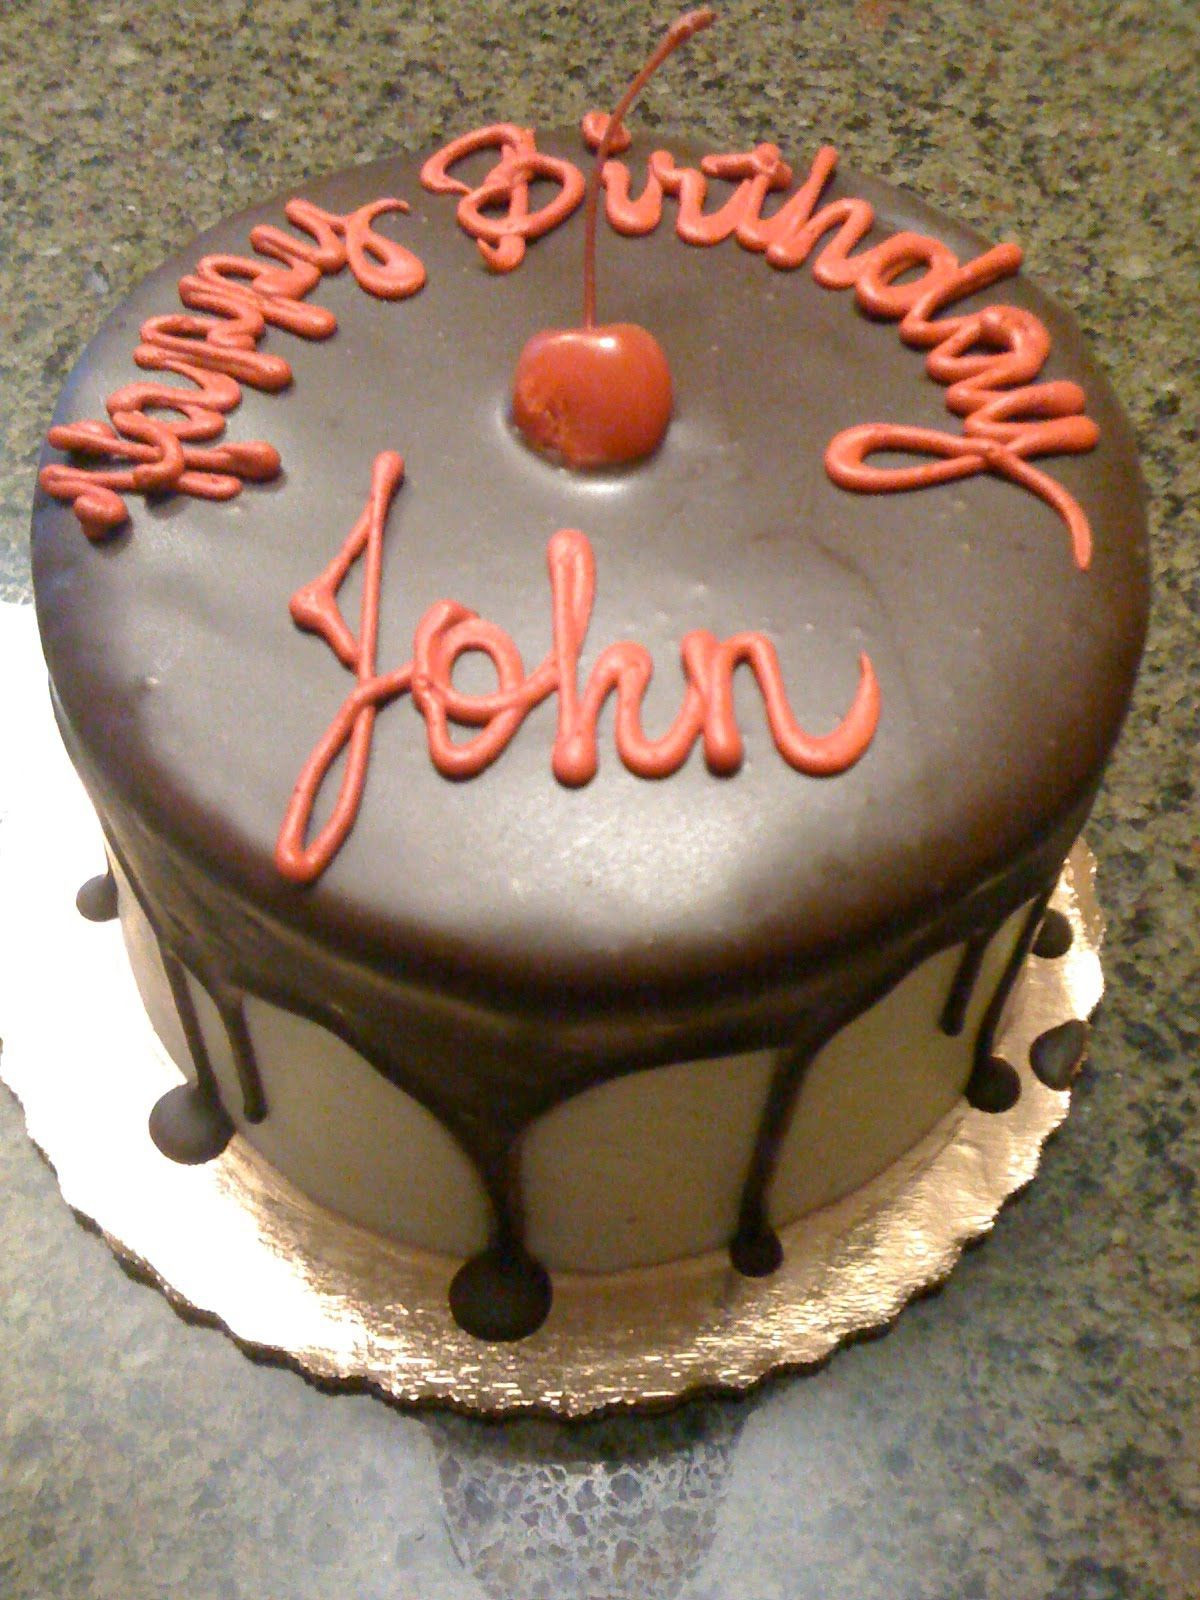 Best ideas about Happy Birthday John Cake . Save or Pin Happy Birthday John Birthday Wishes Now.